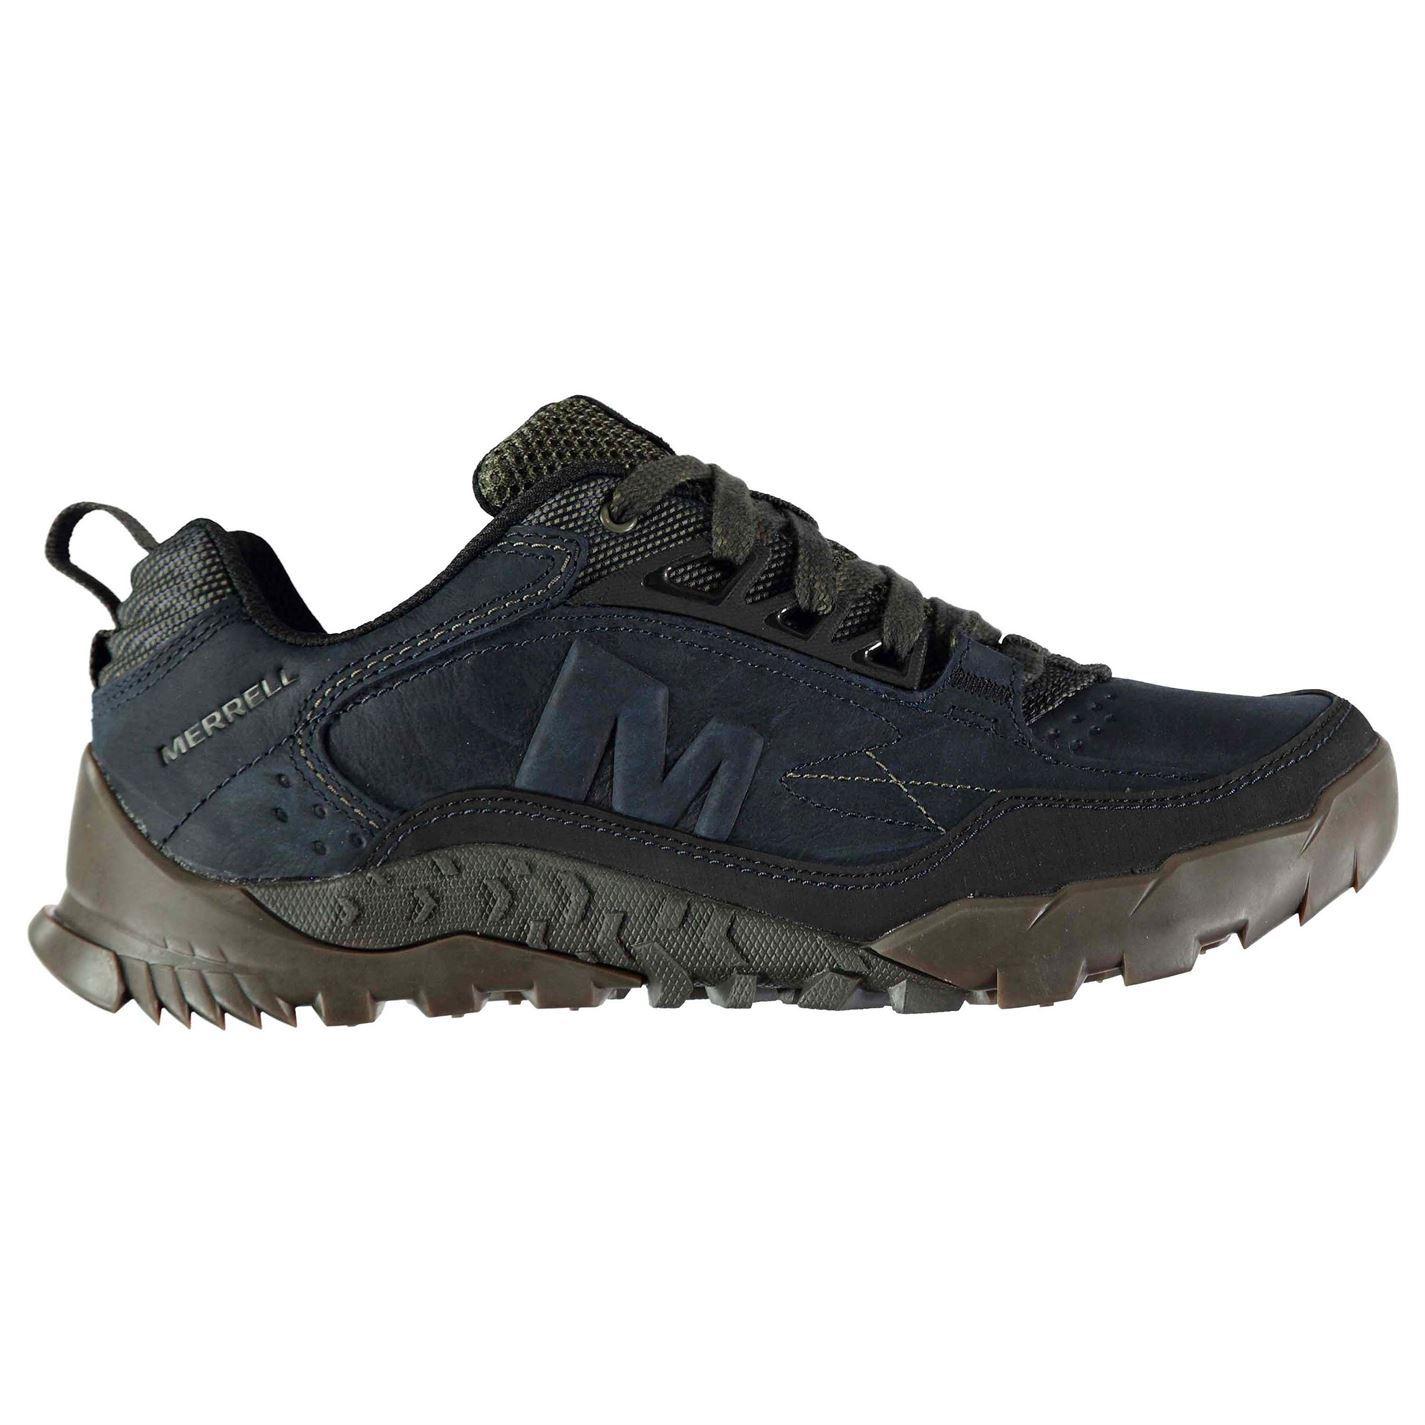 Merrell Annex Trak Lo Walking Shoes